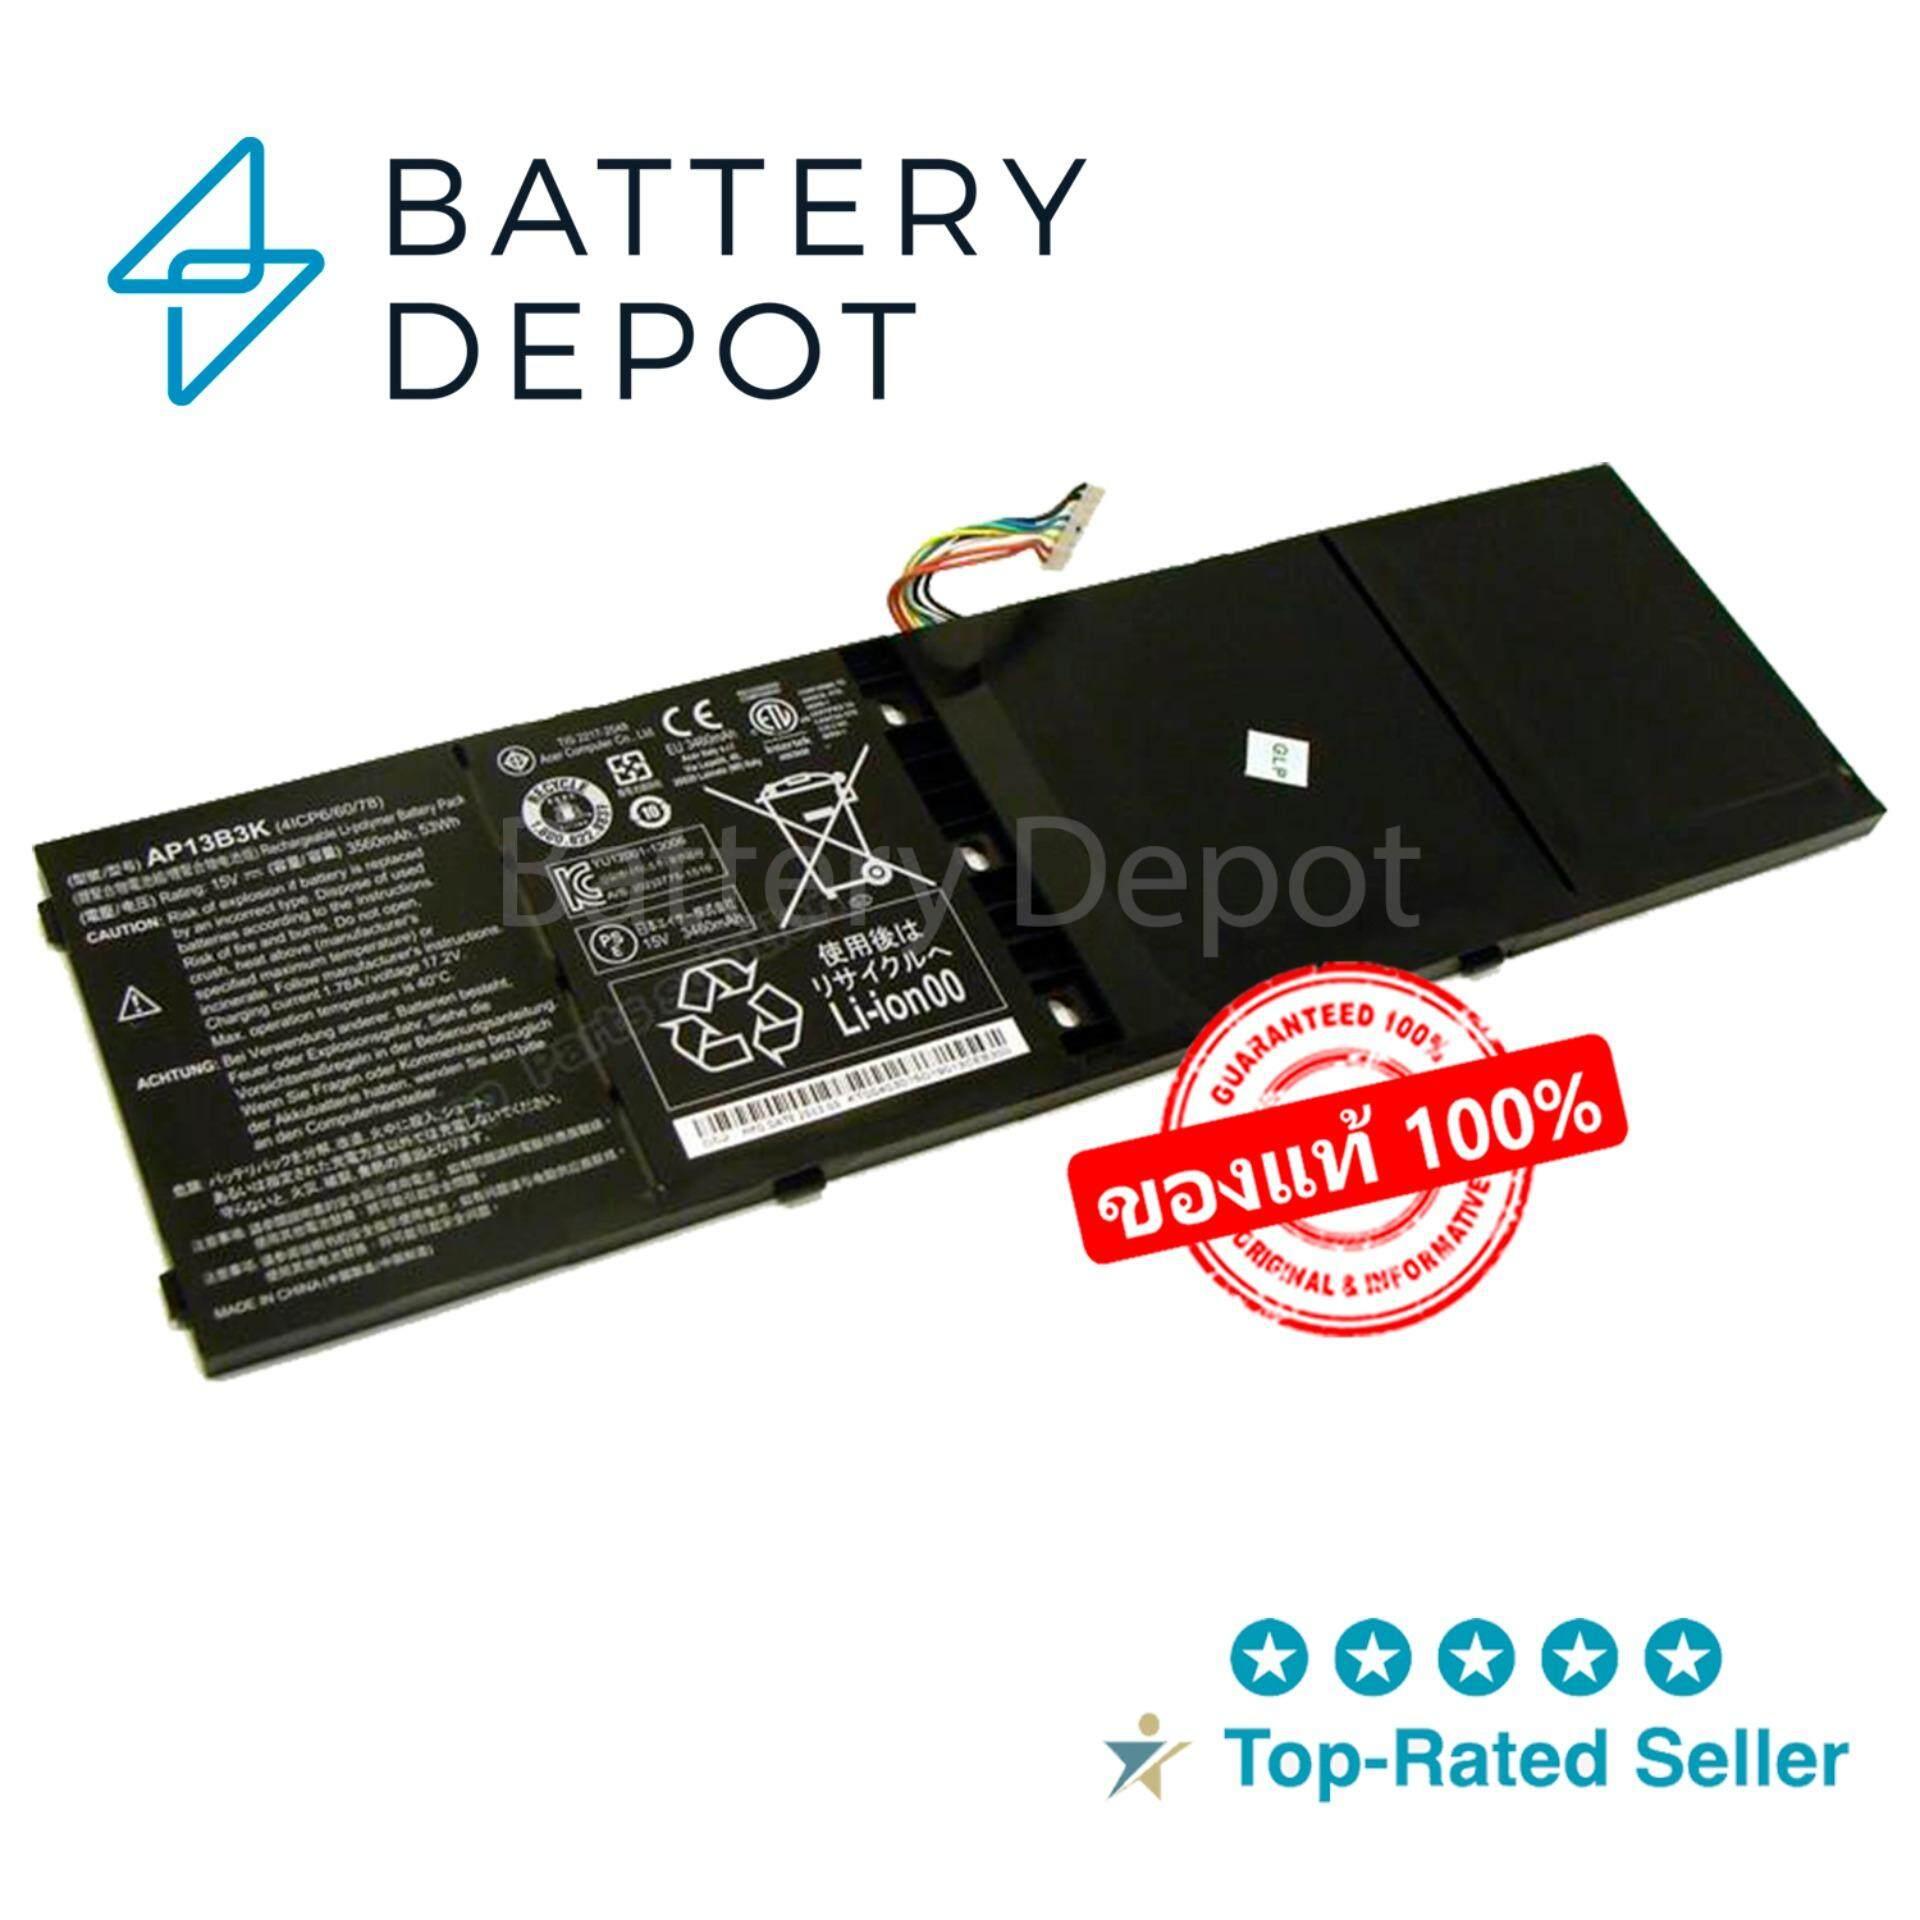 Sell Acer Aspire Vx5 Cheapest Best Quality Th Store Baterai E1 421 421g 431 431g 471 471g 521 531 V3 Oem Thb 2400